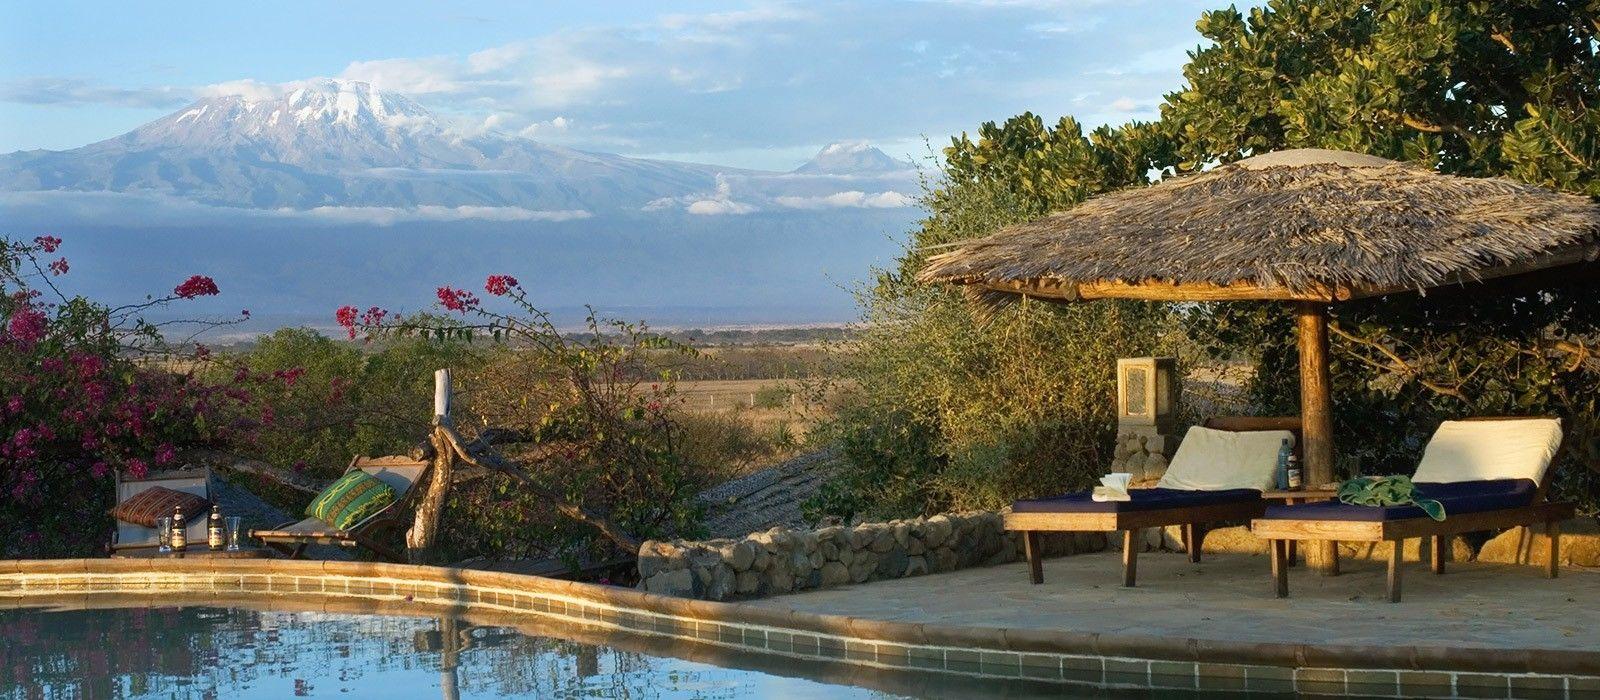 Tansania: Safari Abenteuer & romantisches Sansibar Urlaub 5